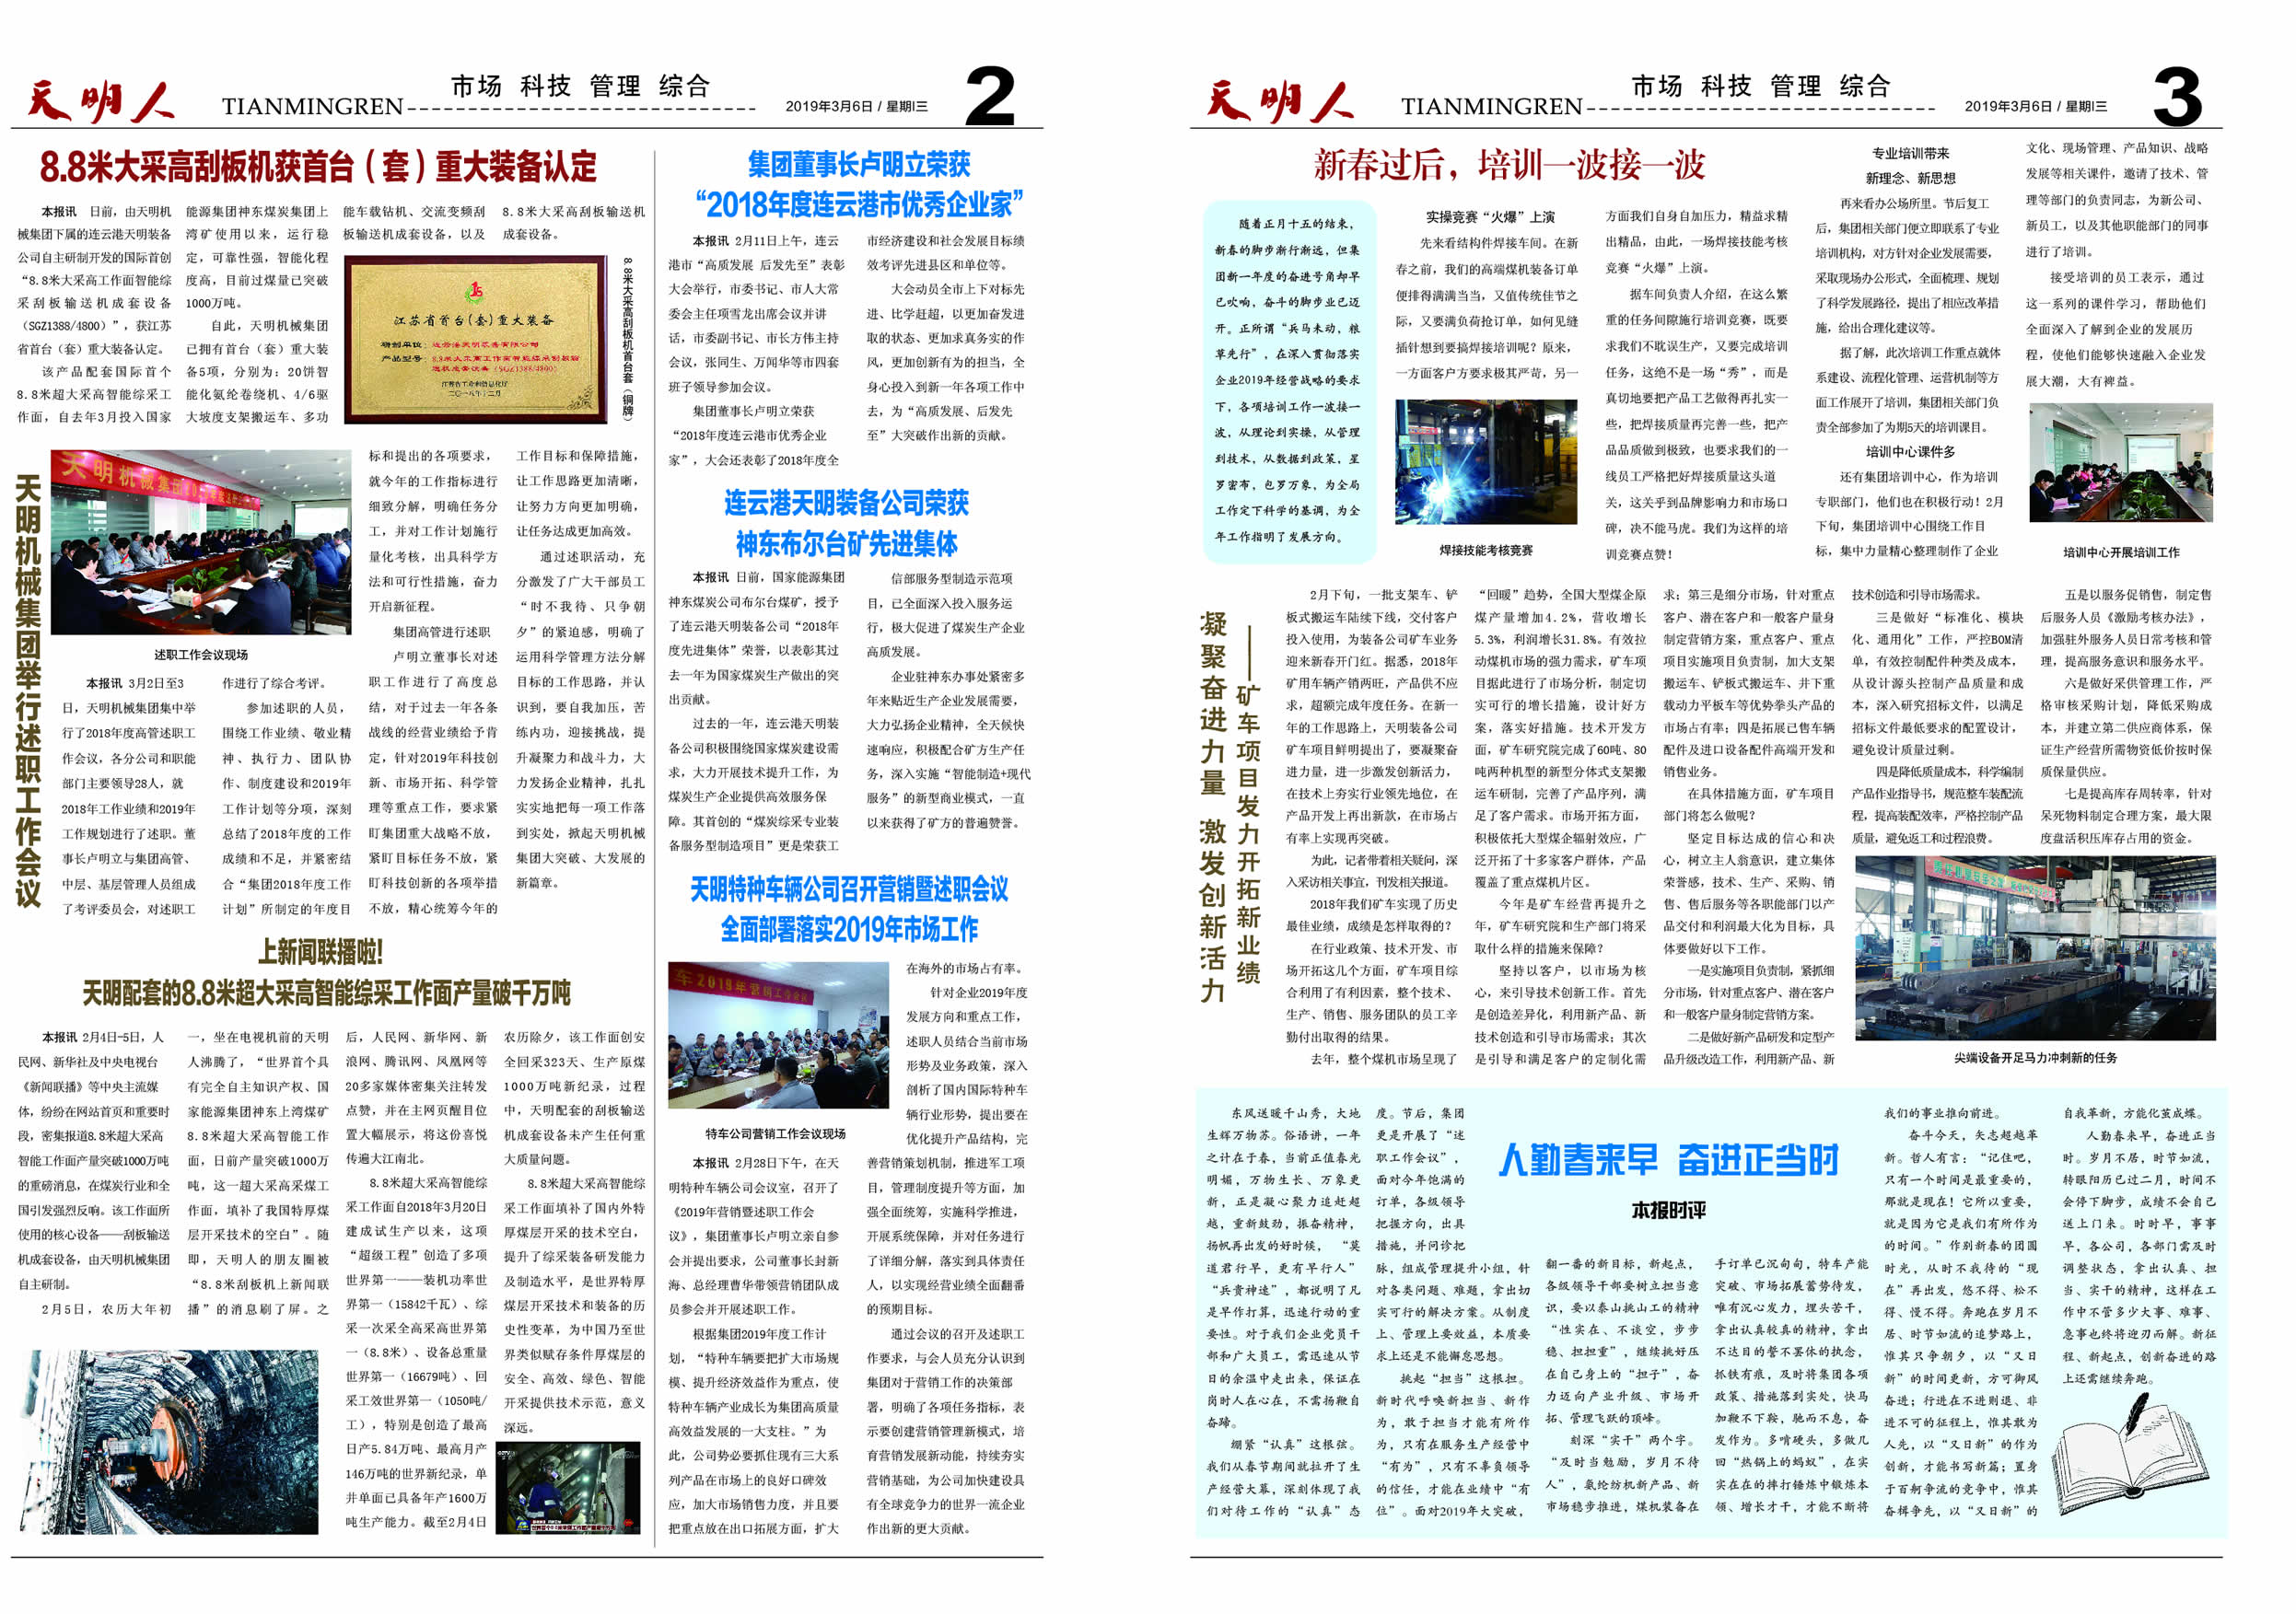 bob线上体育_bob体育官网娱乐_BOBSPORTS平台人2019年第二期(总第122期)2、3版